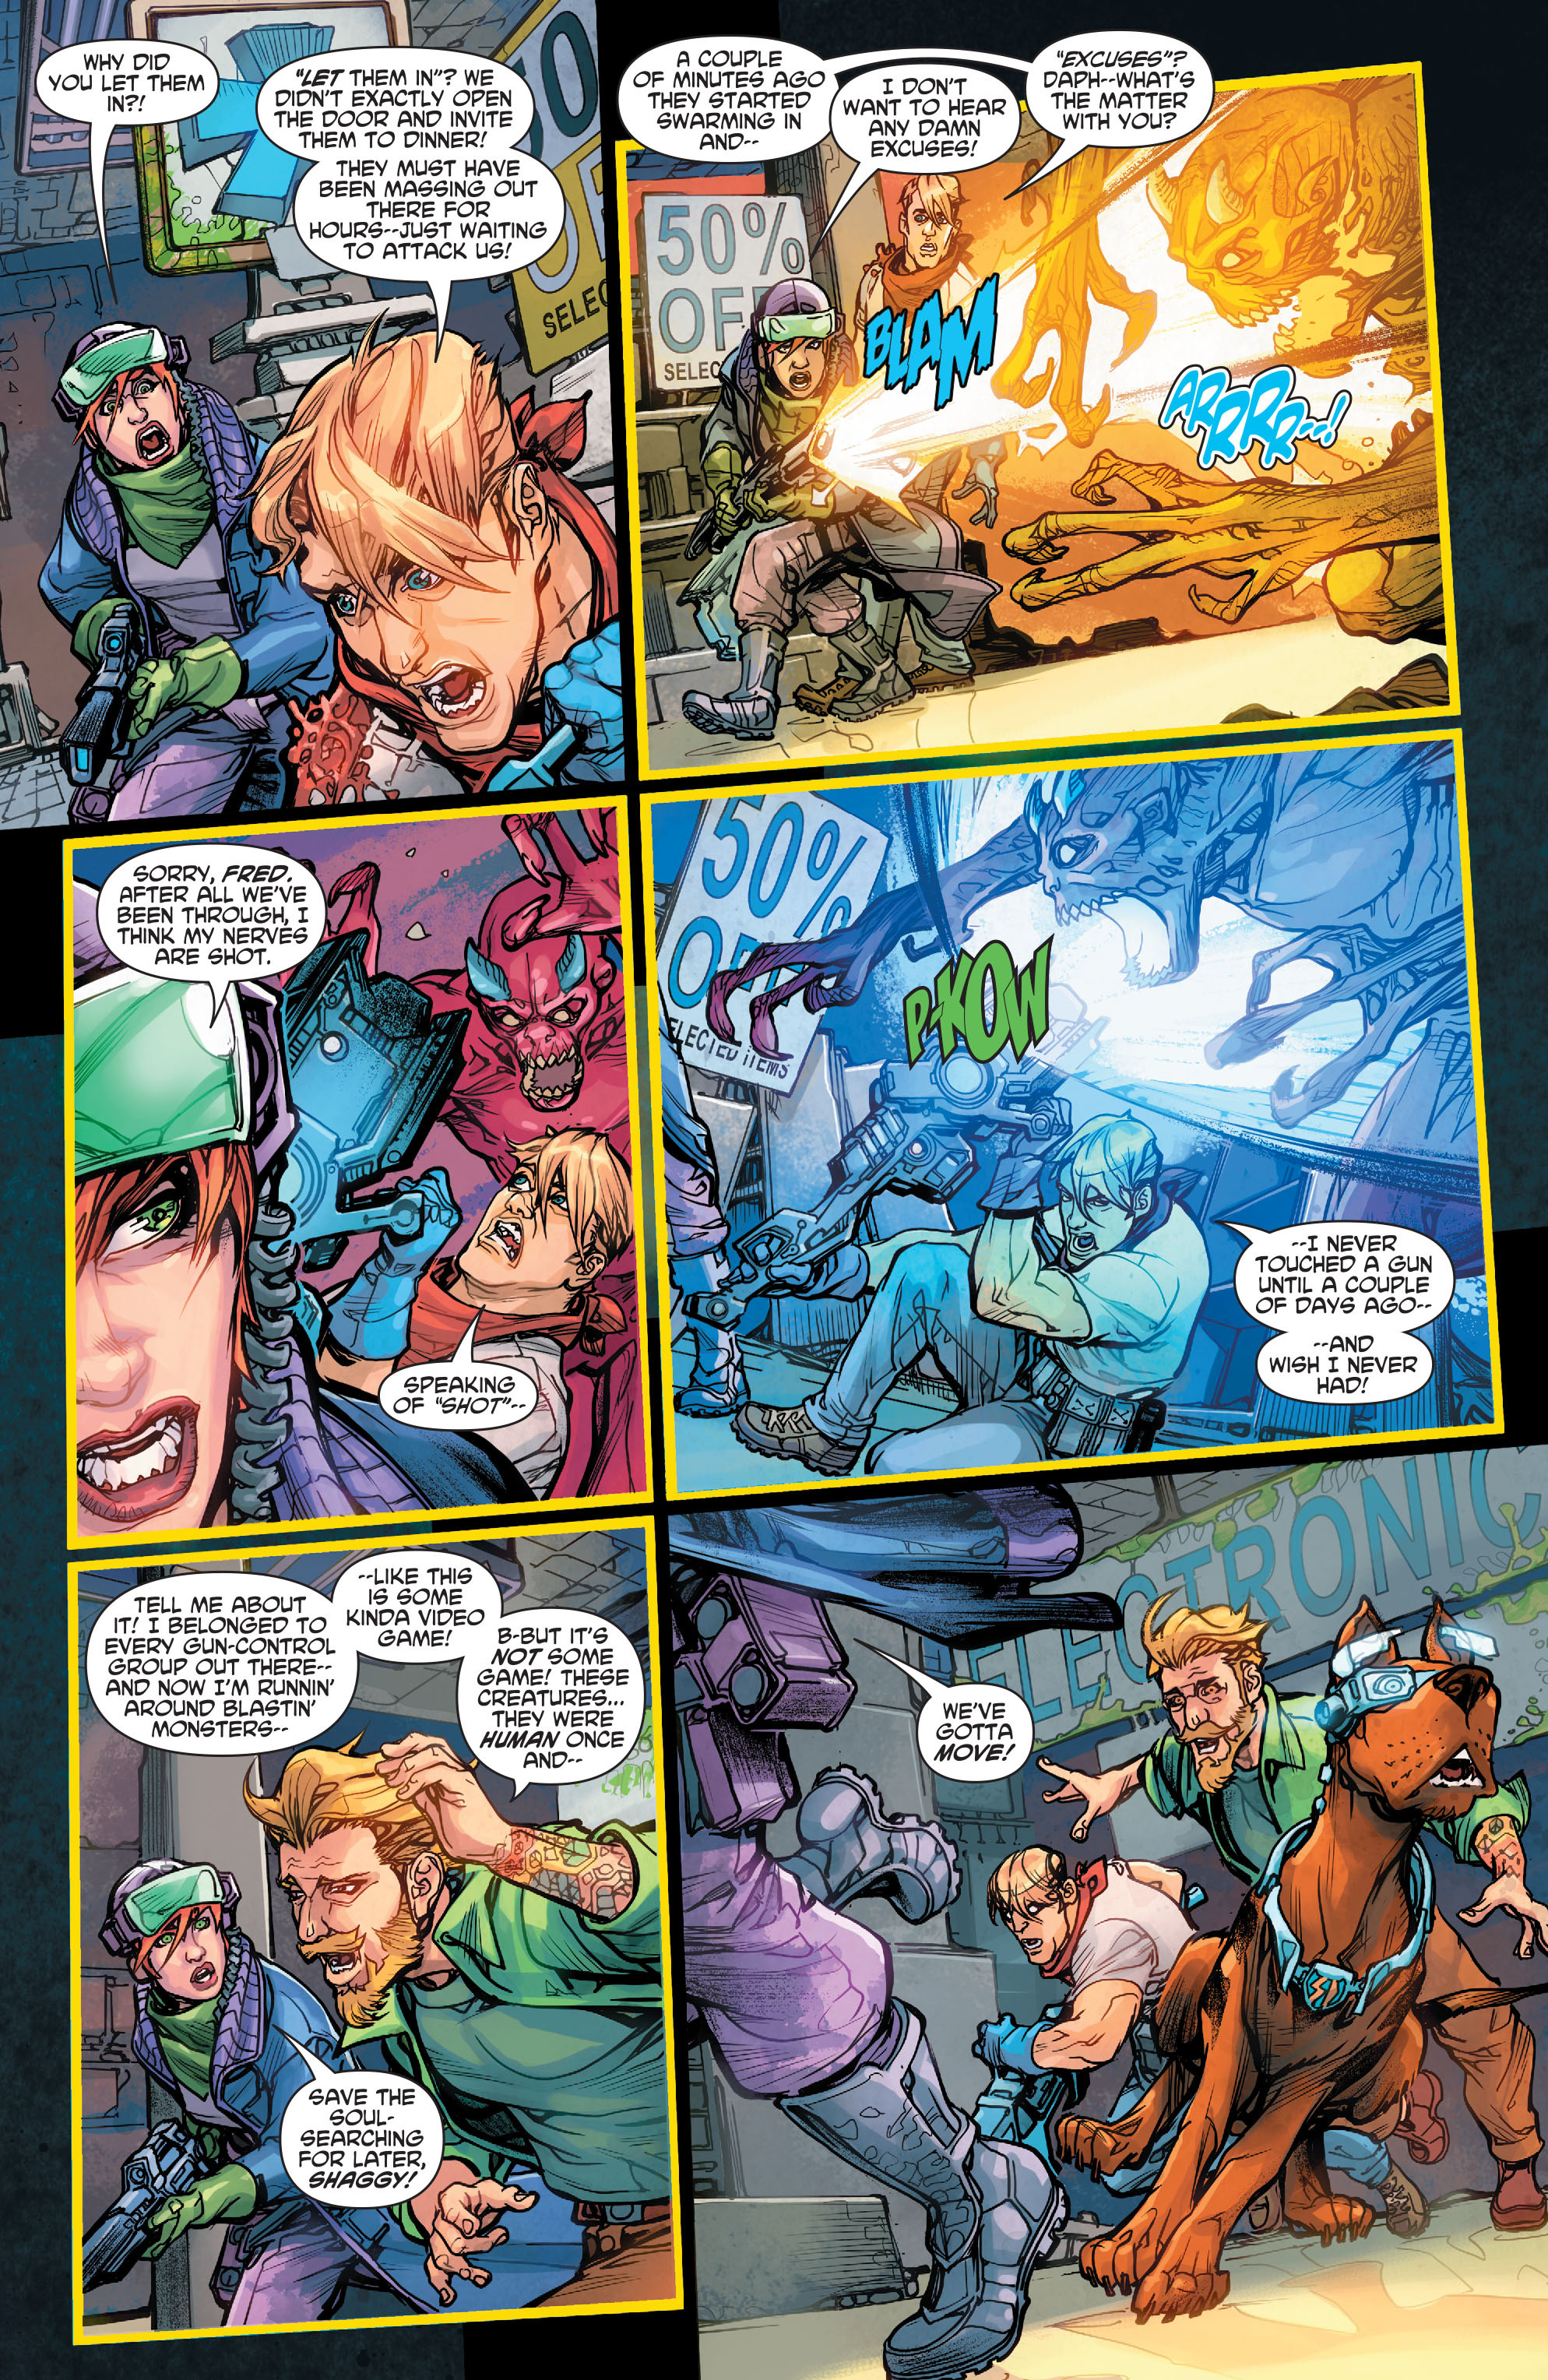 Read online Scooby Apocalypse comic -  Issue #5 - 7